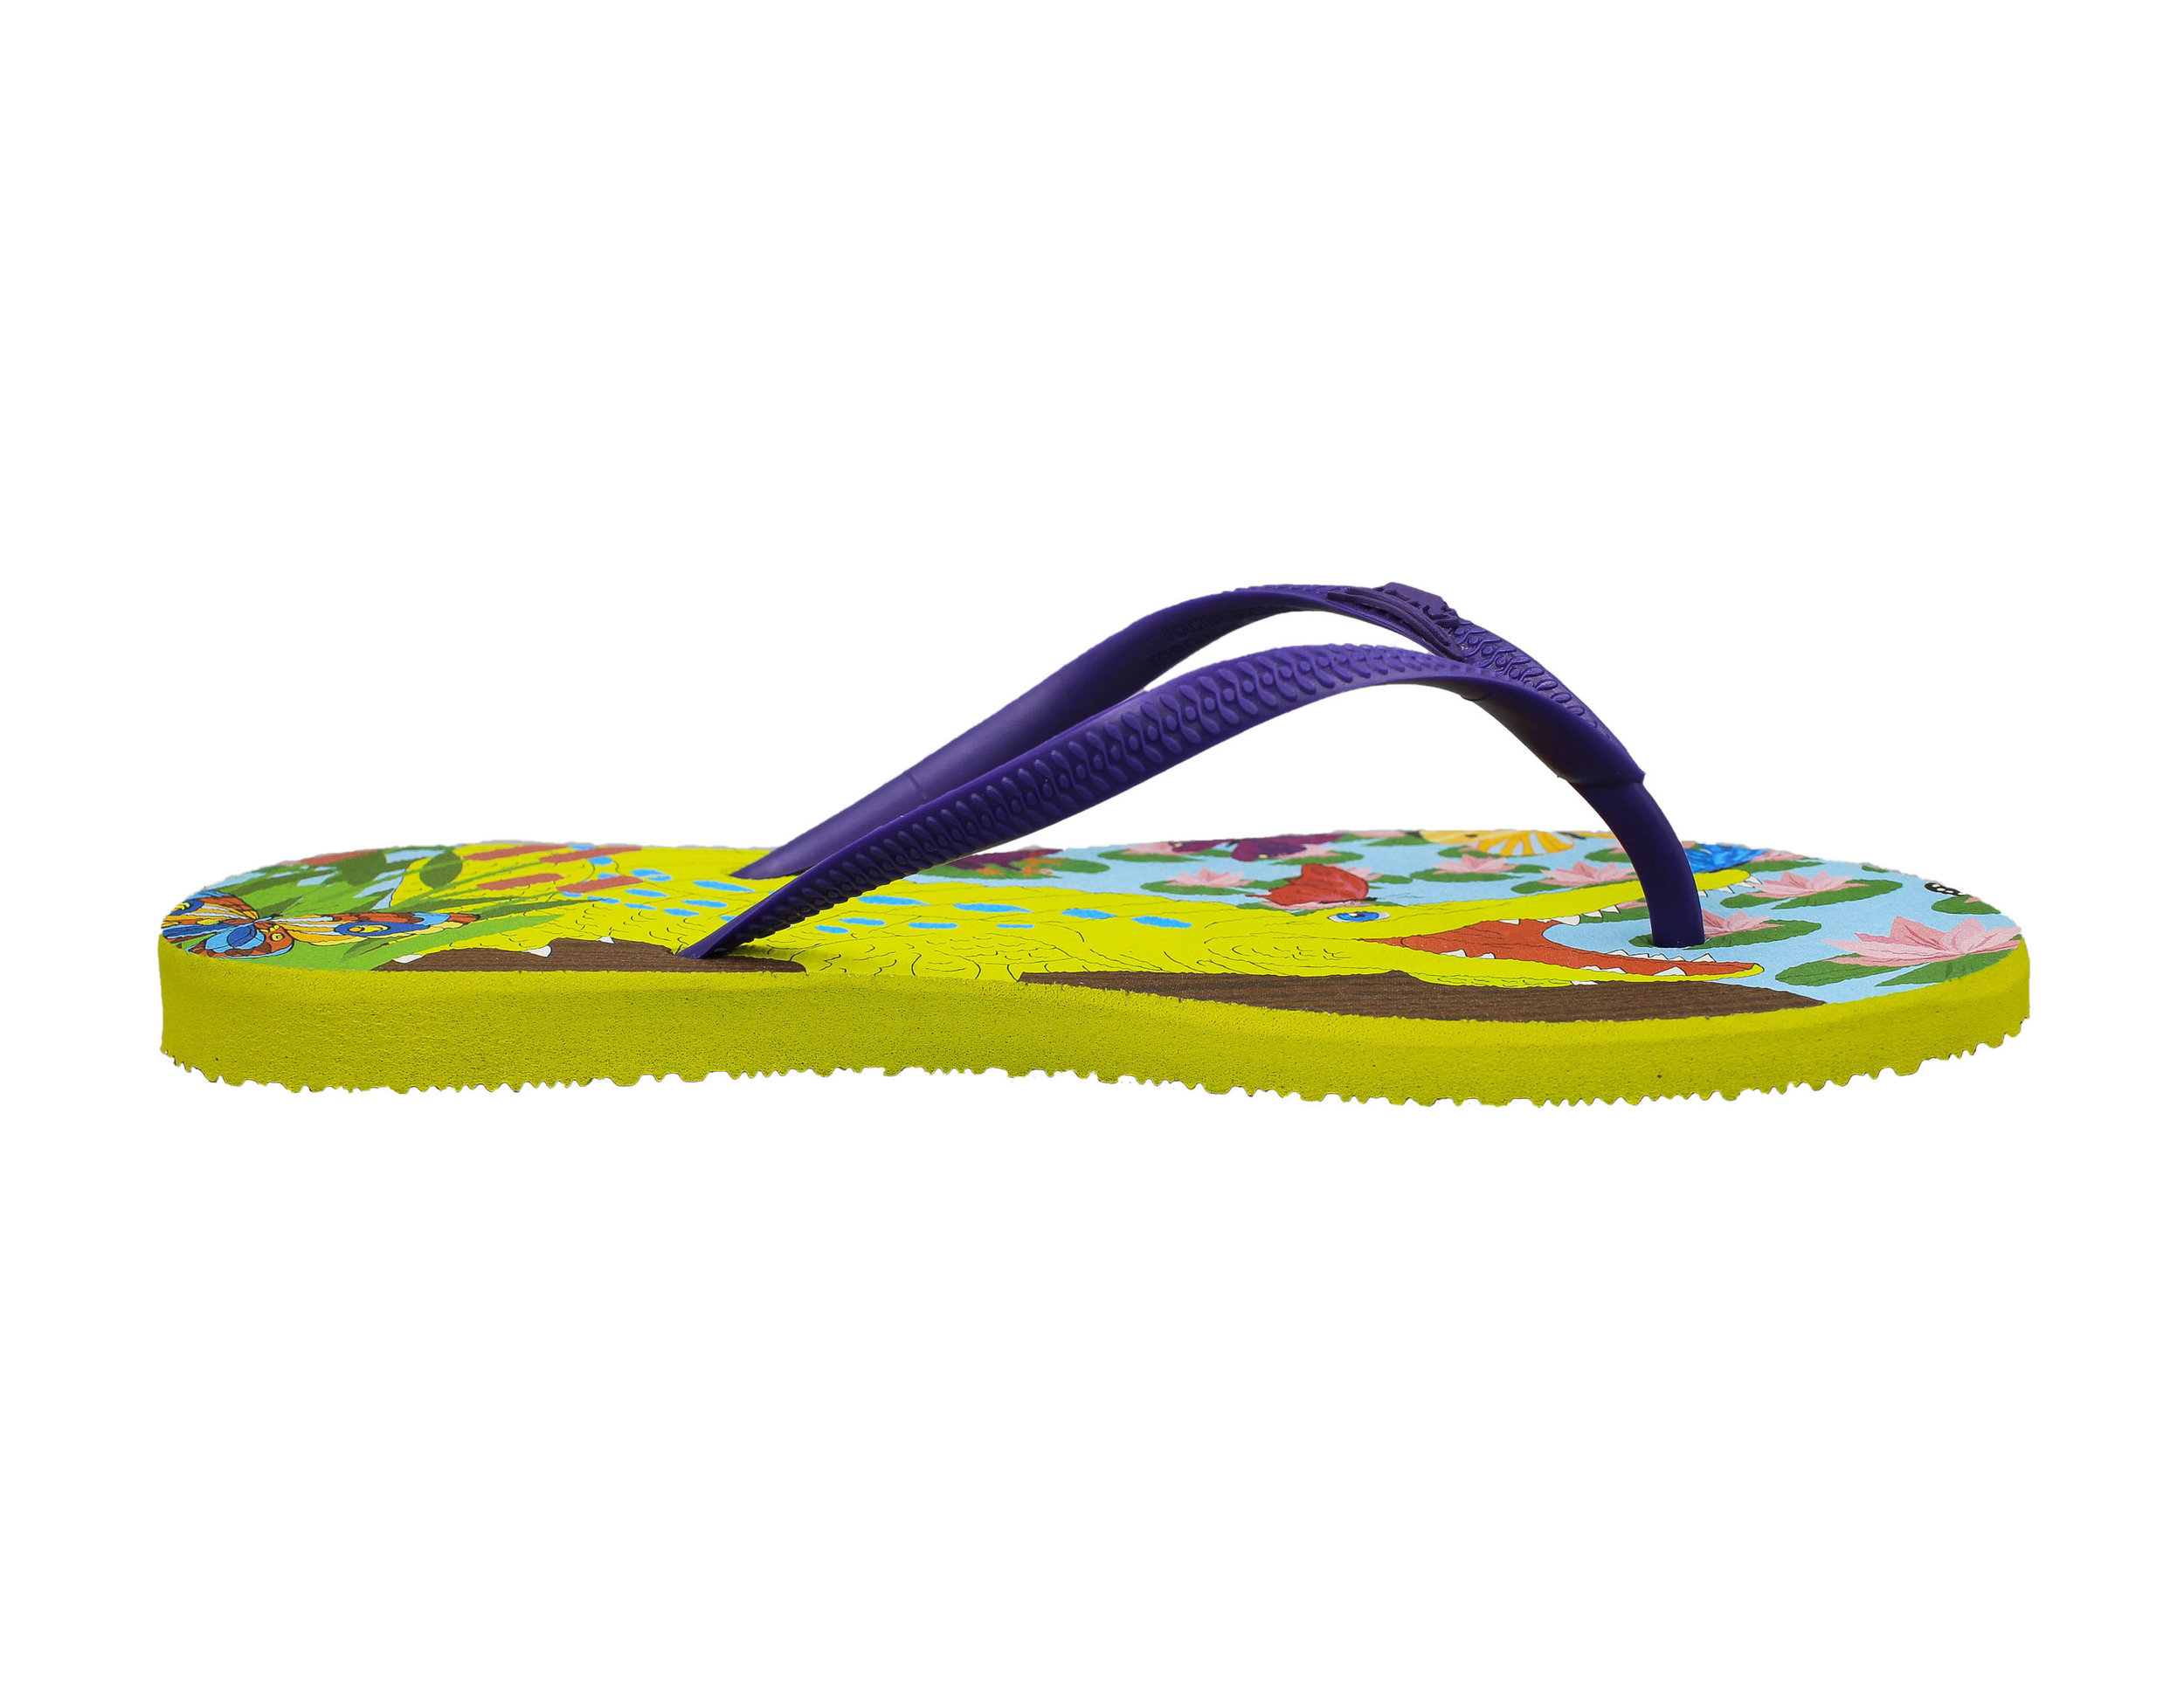 b6d6eb448 Snappy Croc. Crocodile flip flop